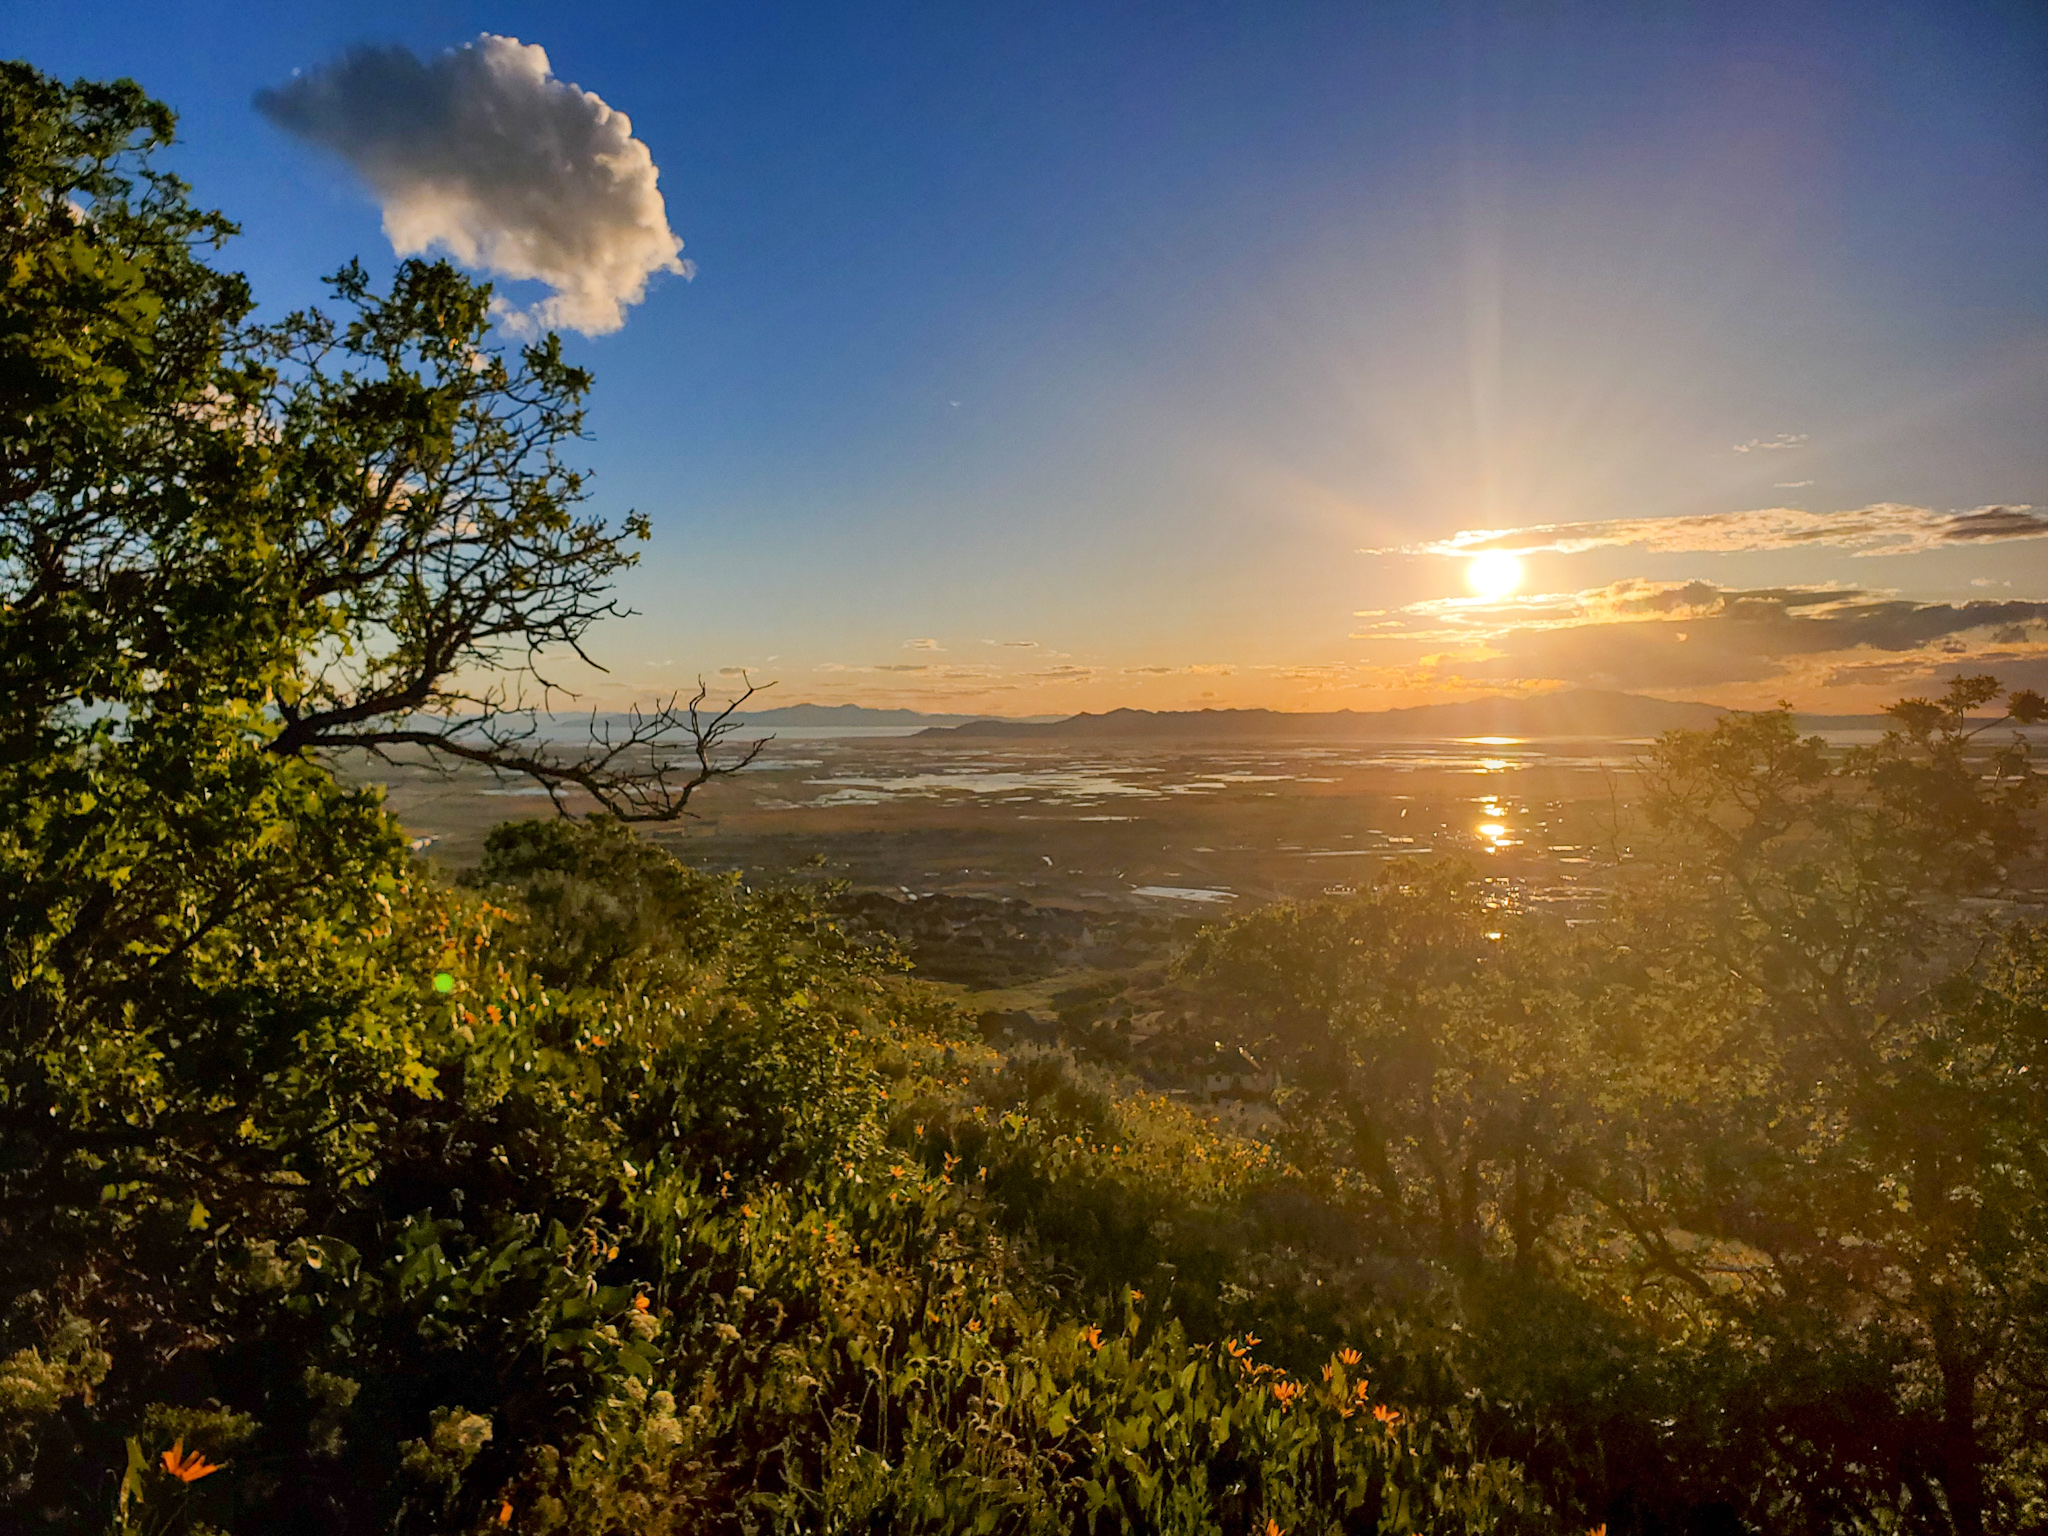 davis county hiking trails, bountiful utah